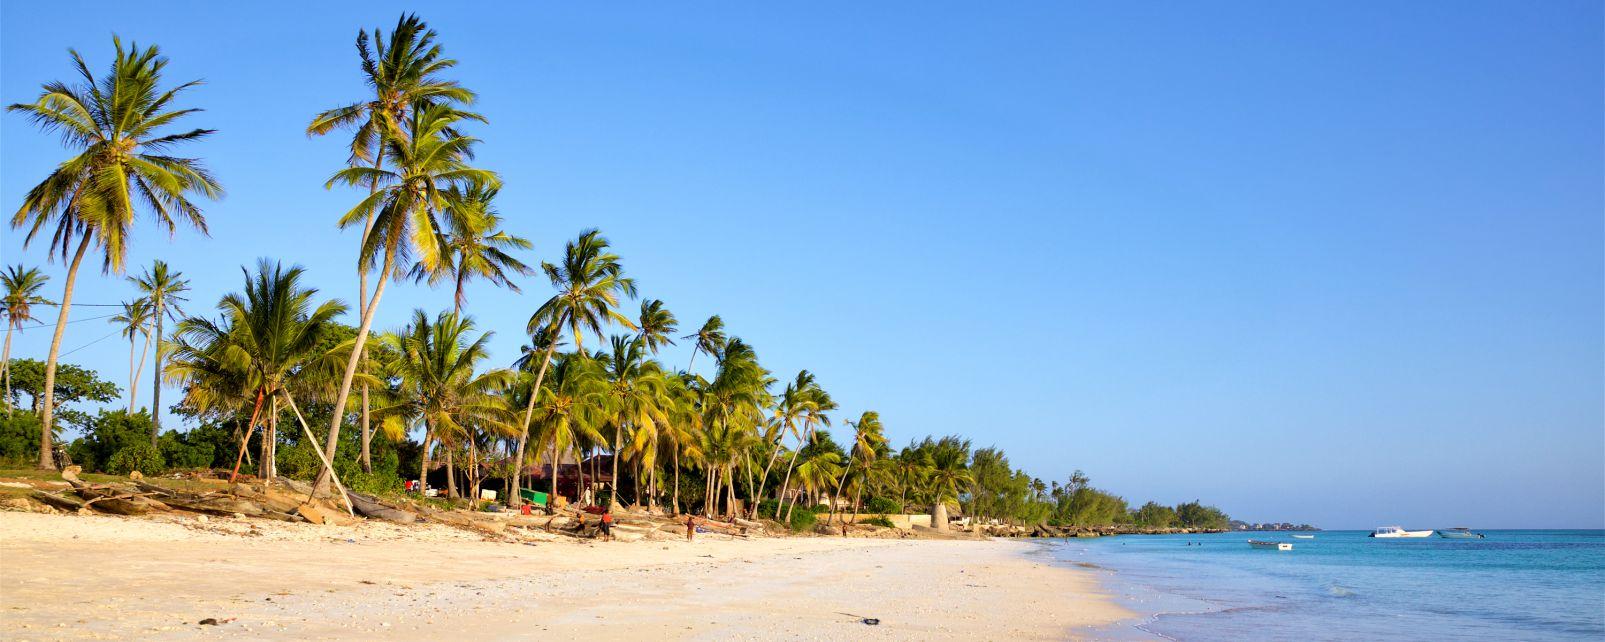 Afrique; Zanzibar; Kizimkazi;